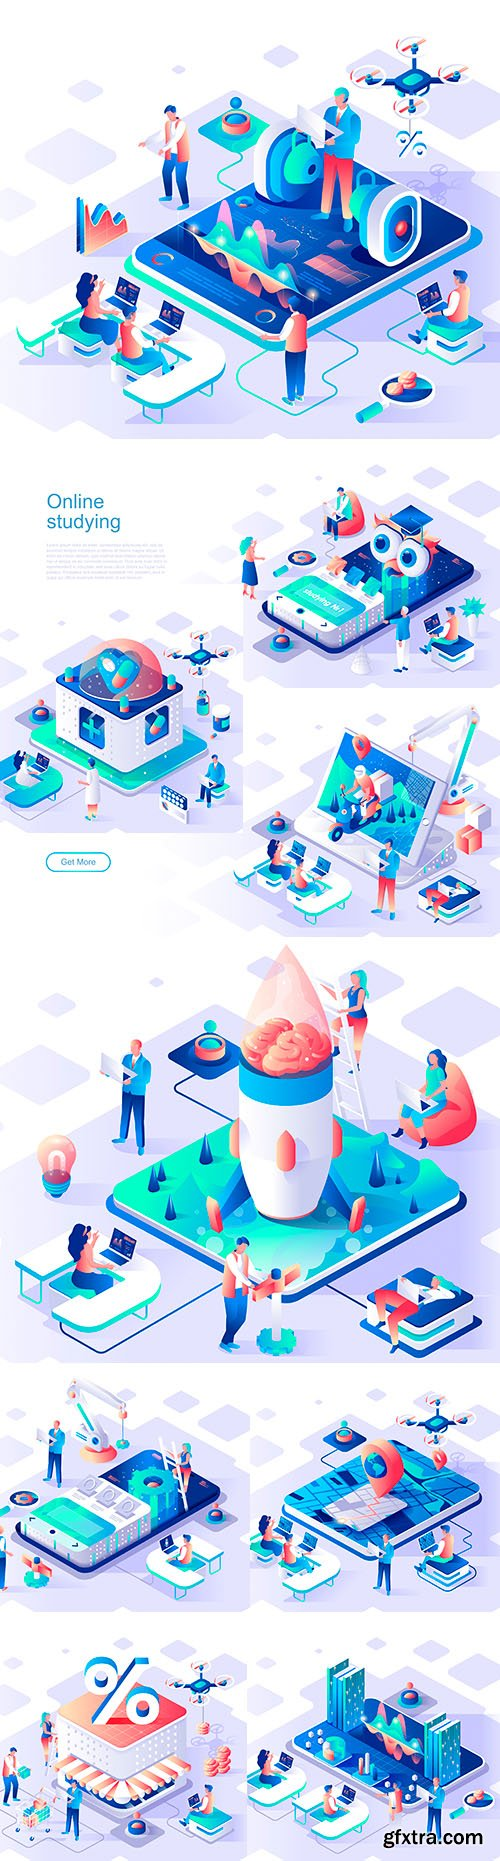 Internet technology and app isometric 3d flat design